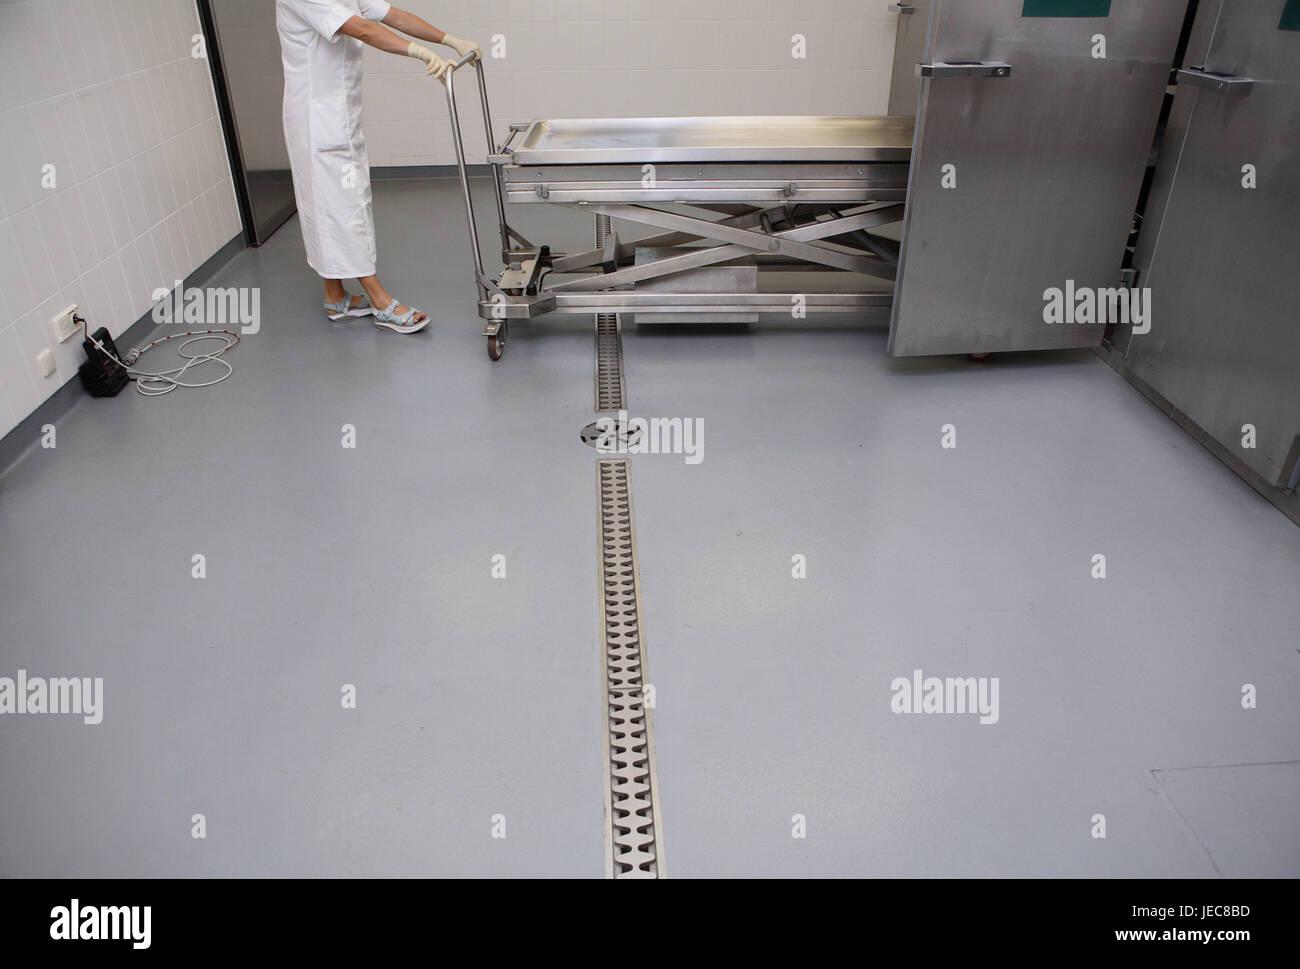 Hospital, pathological-anatomical department, Prosektur, Angestelle, rolling carriage, cold storage room, medicine, - Stock Image